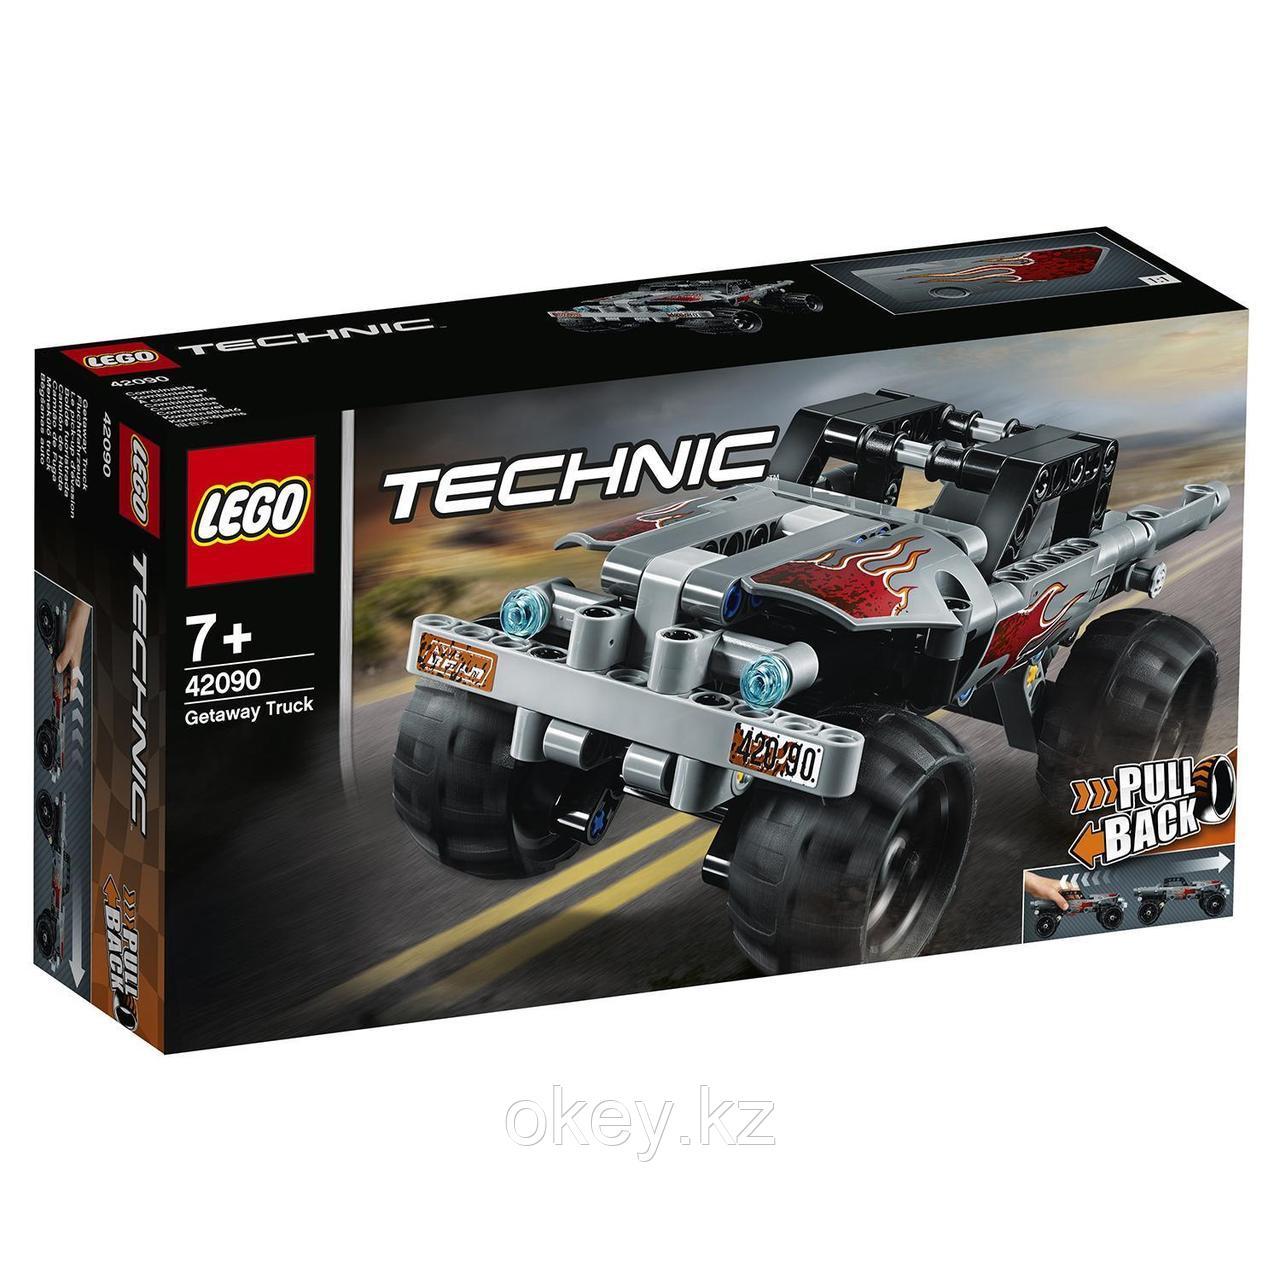 LEGO Technic: Машина для побега 42090